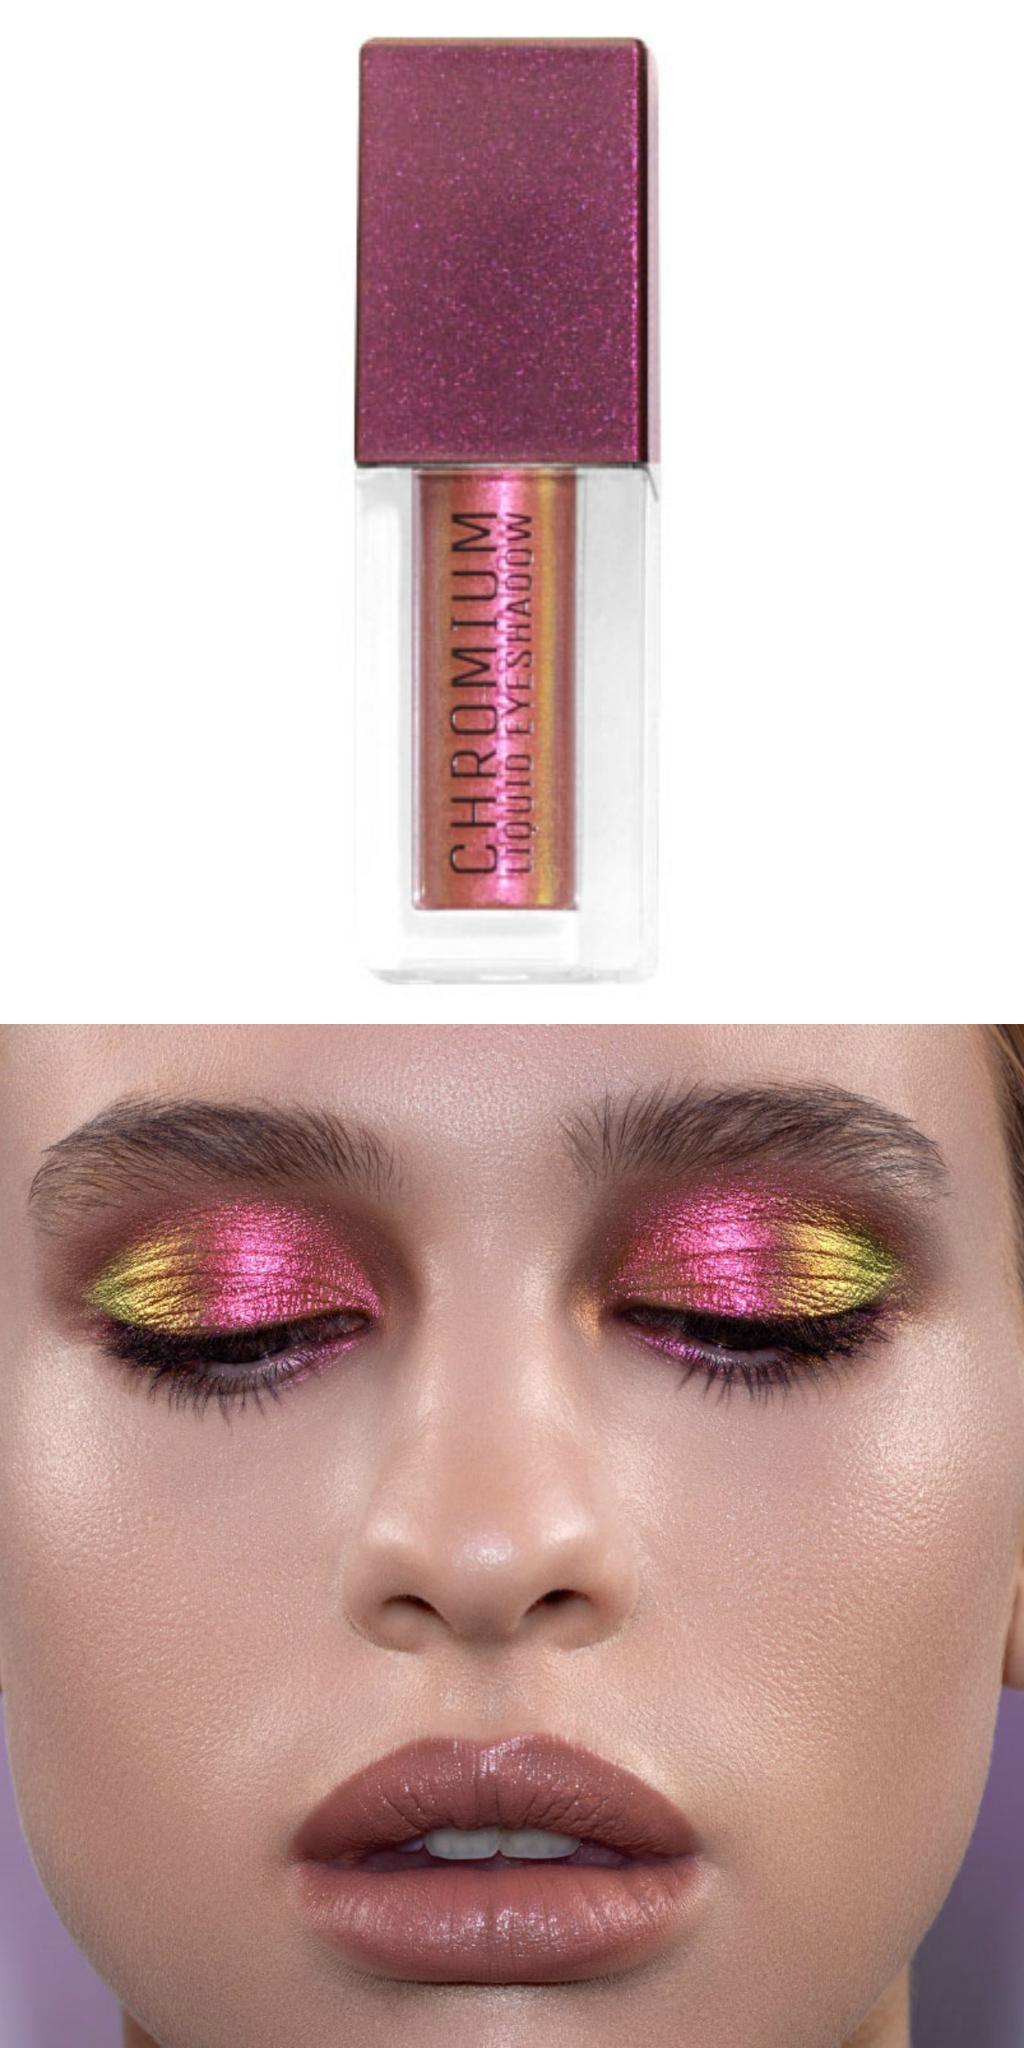 Natasha Denona Chromium Liquid Eyeshadow Dragonfly